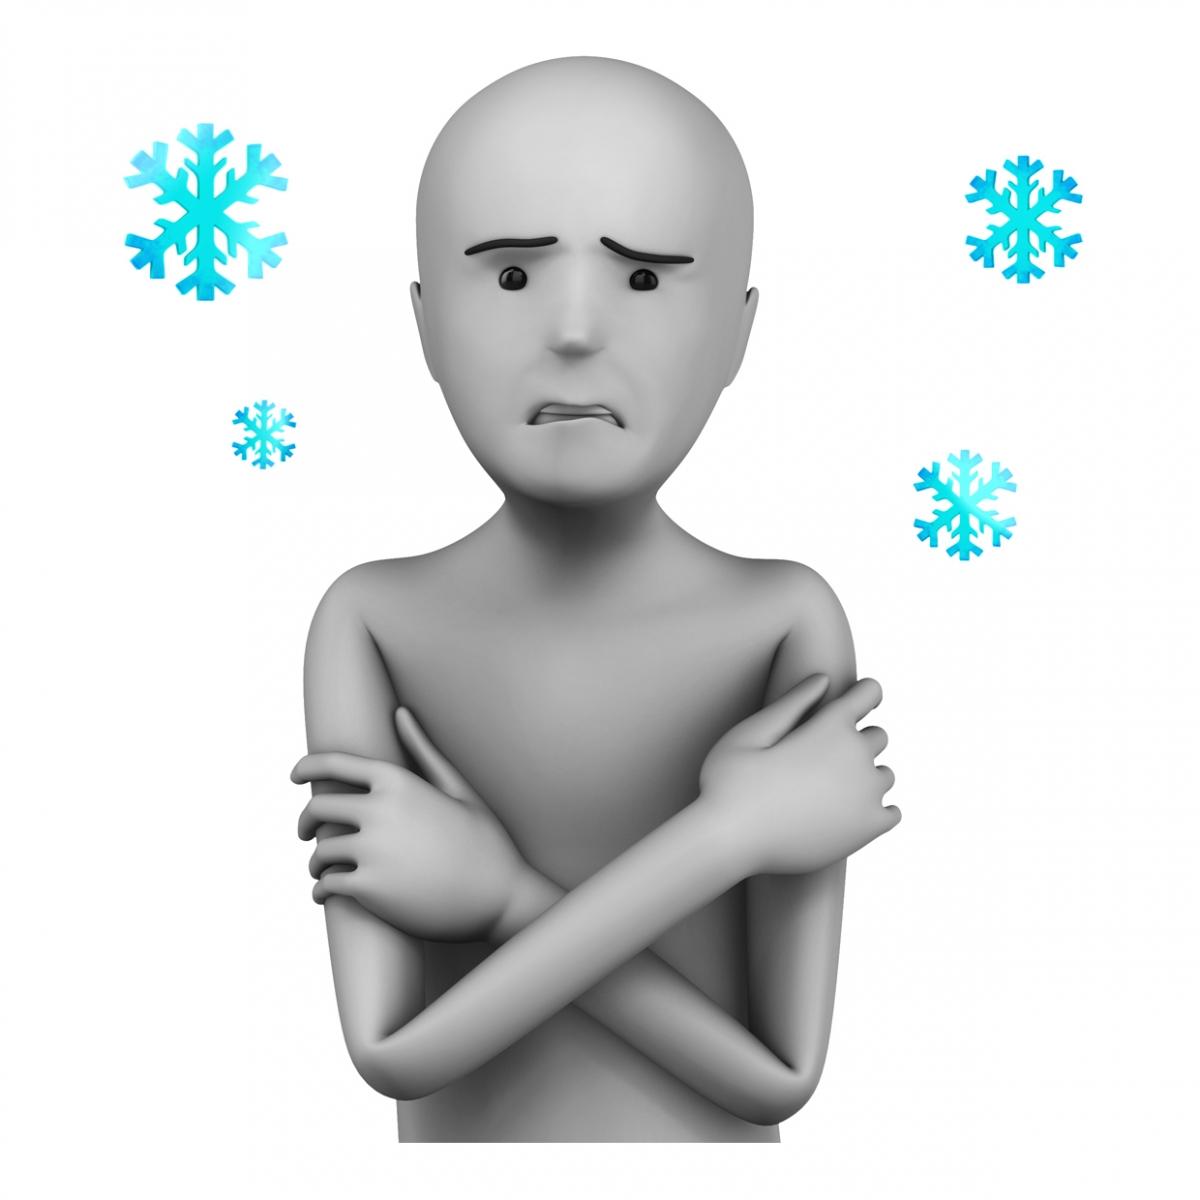 Persona friolera